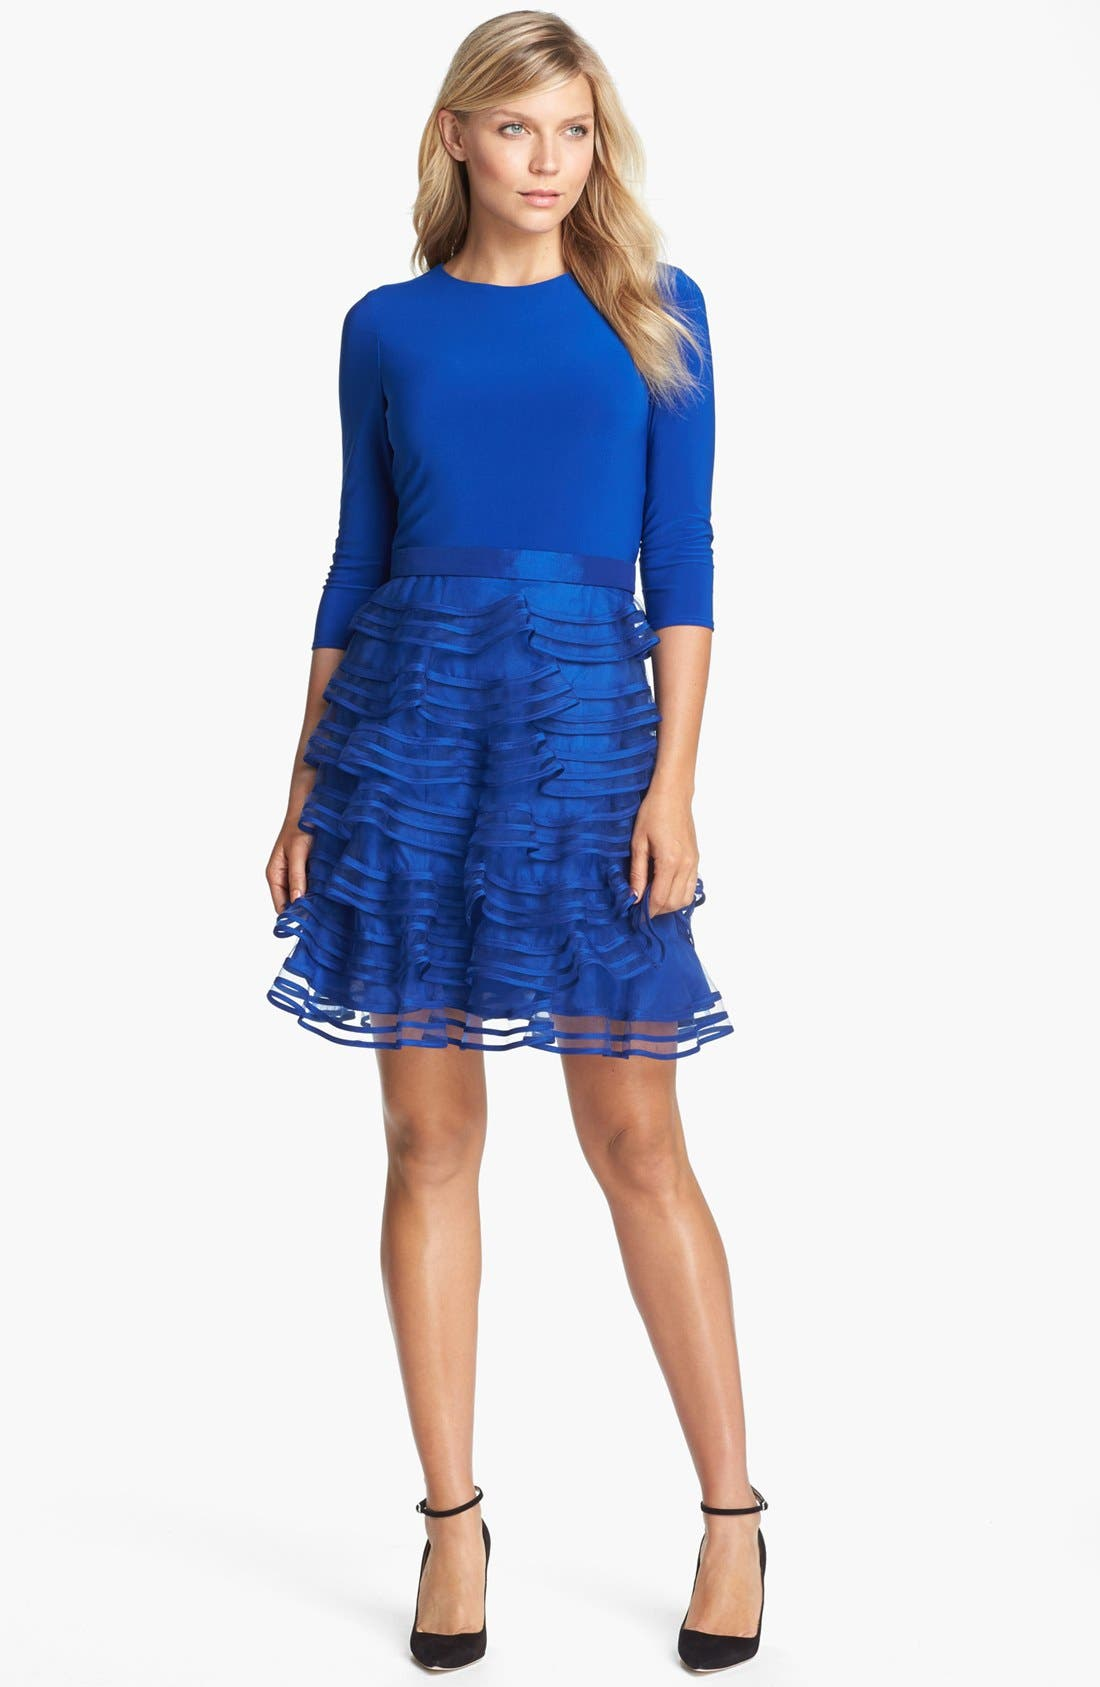 Alternate Image 1 Selected - Kathy Hilton Tiered Skirt Mixed Media Dress